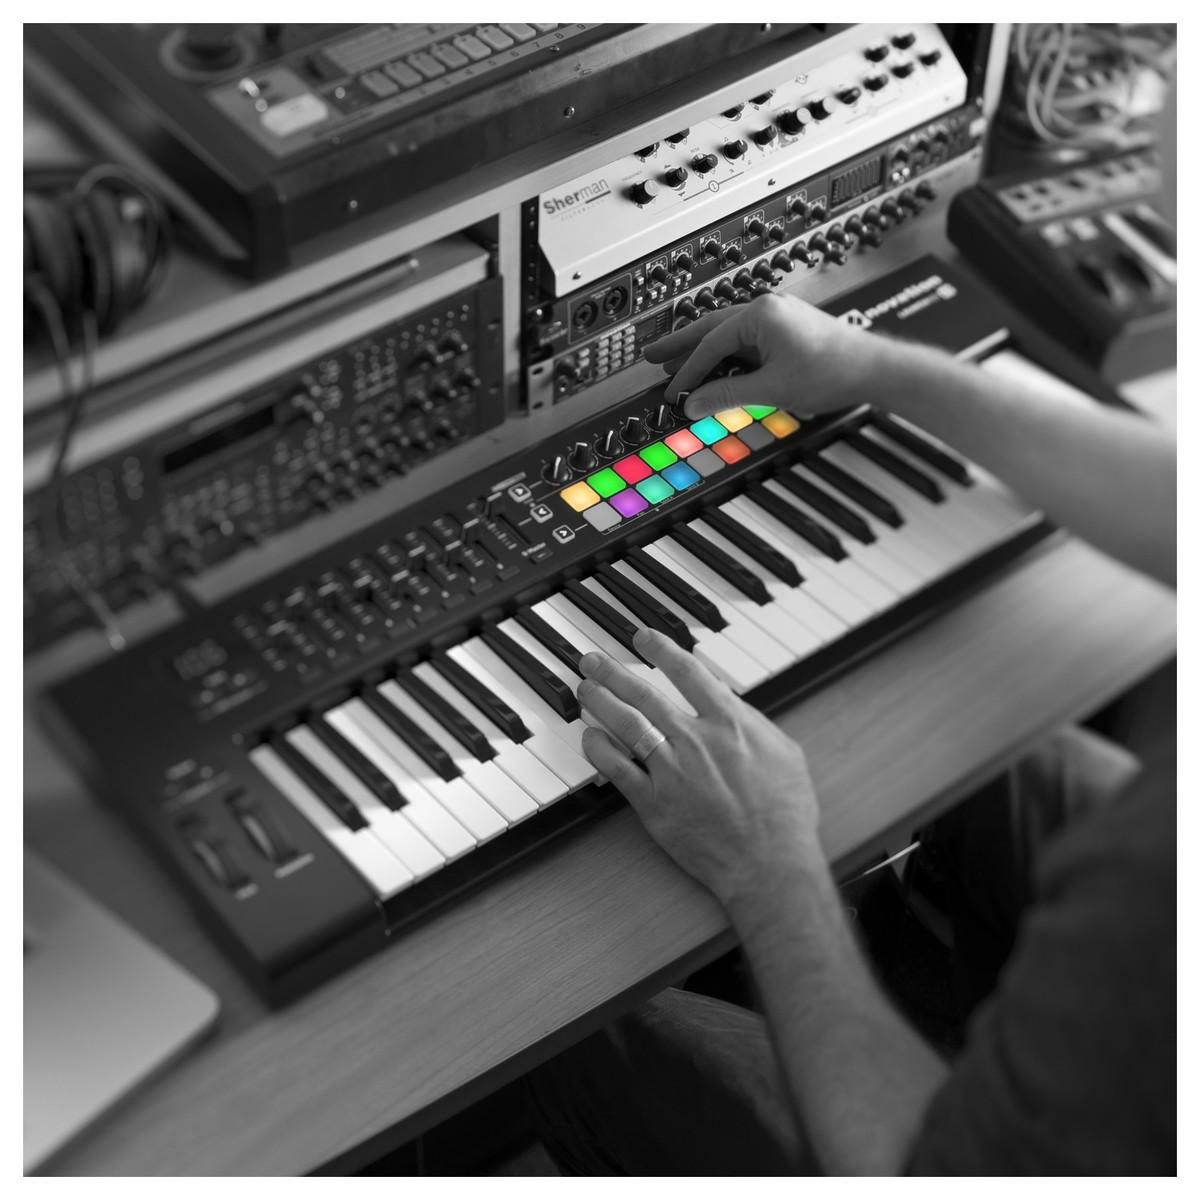 novation launchkey 49 mk2 midi controller keyboard at gear4music. Black Bedroom Furniture Sets. Home Design Ideas